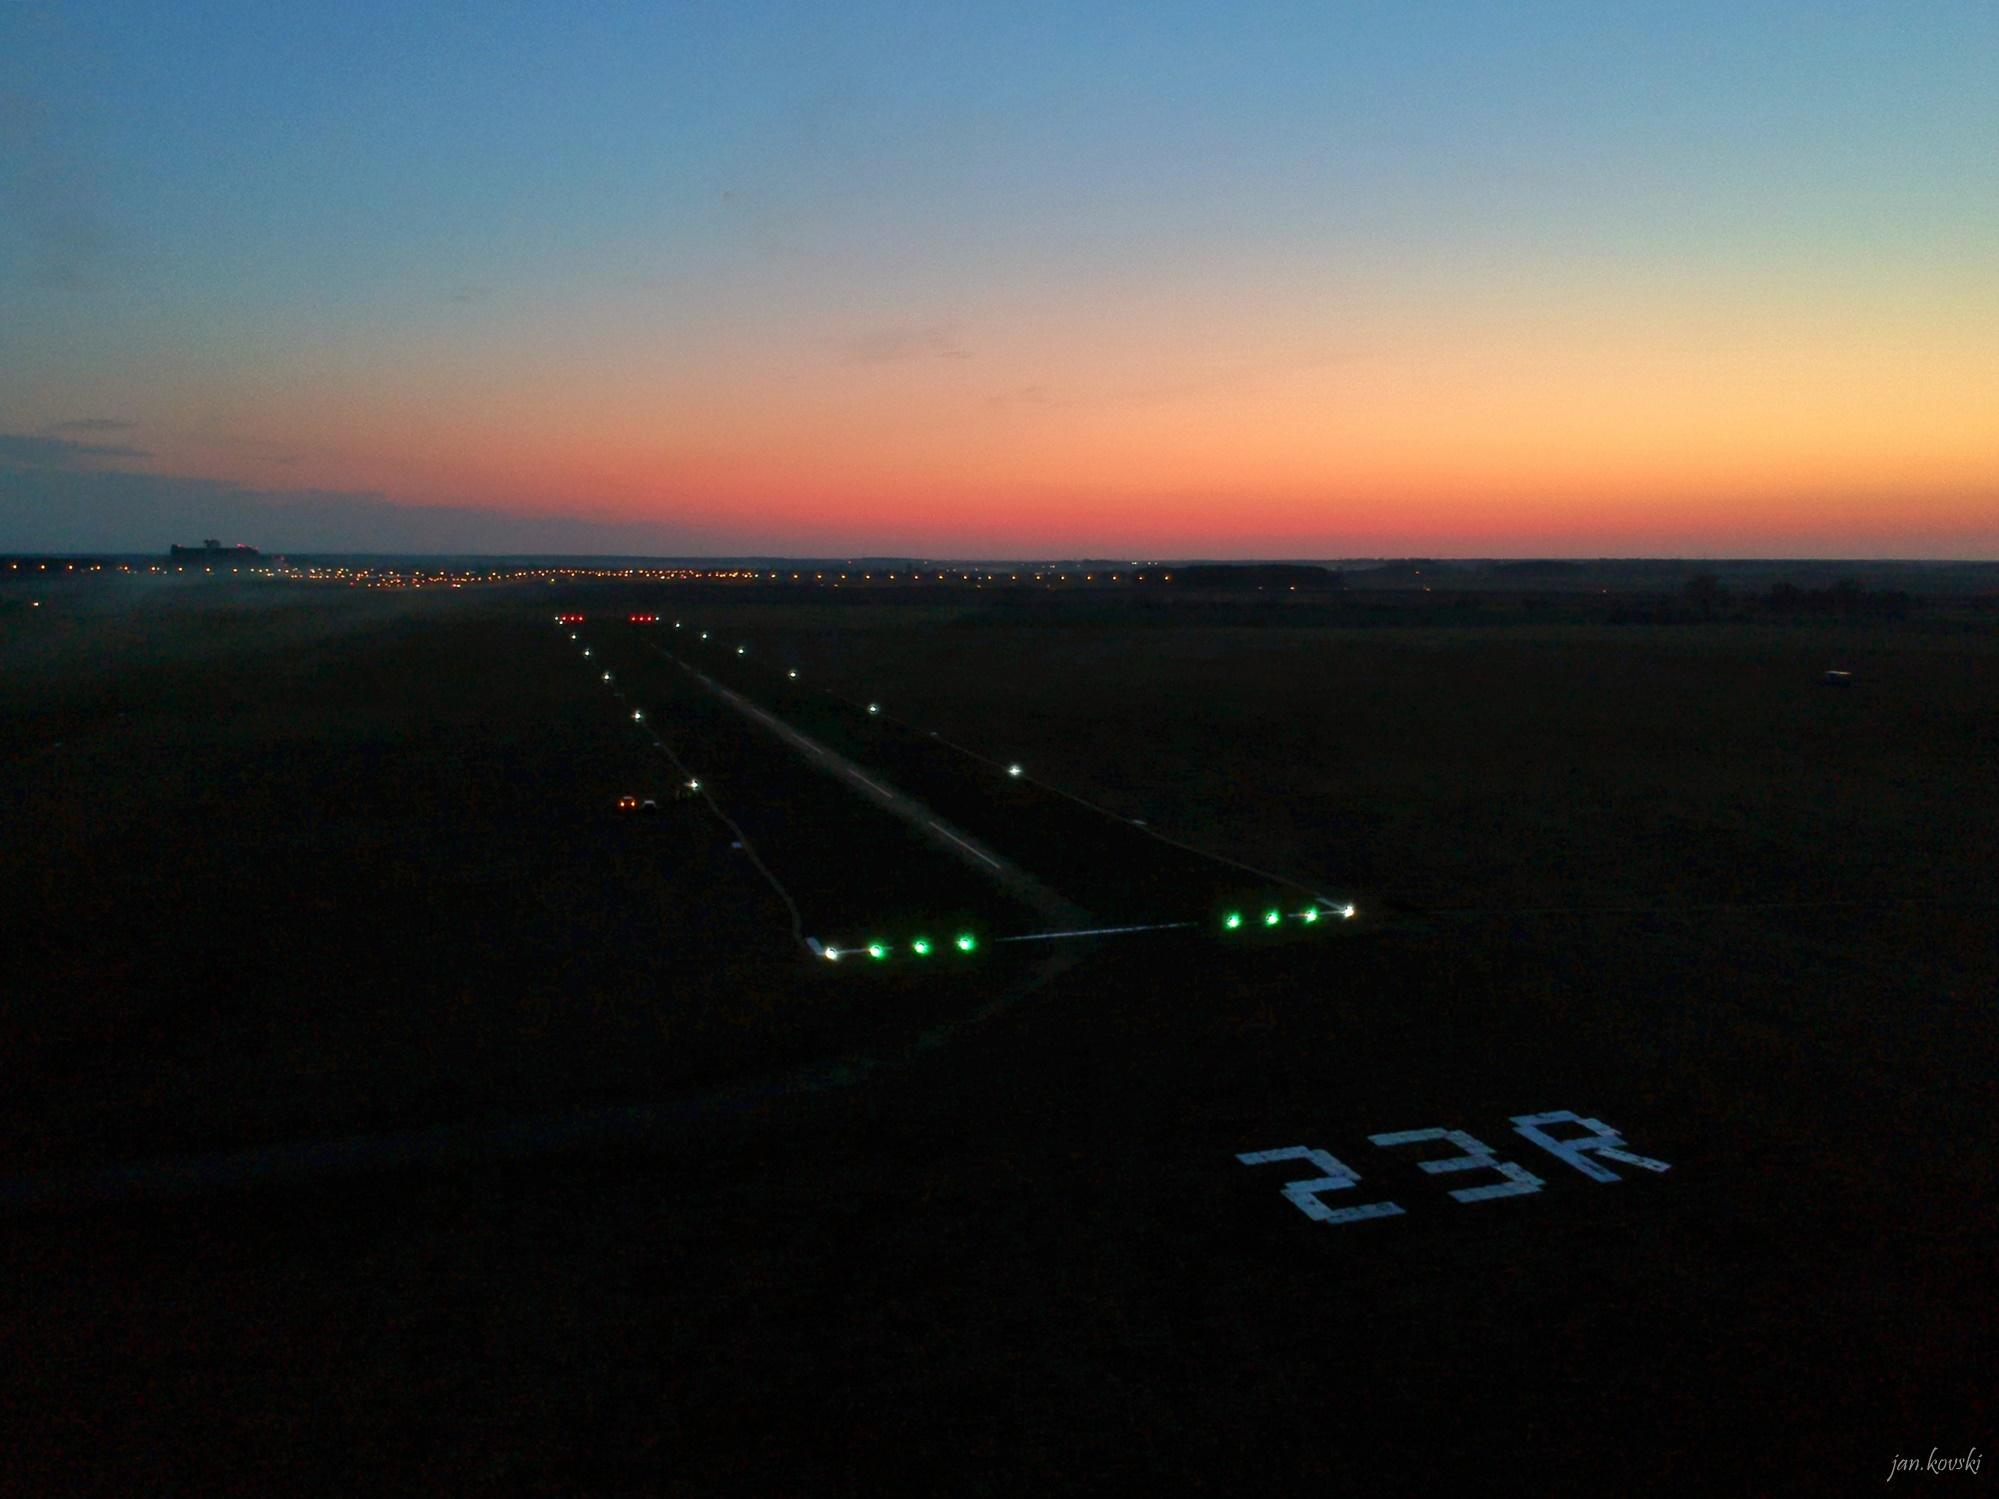 lotnisko leszno oświetlone  - jan.kovski/Lotnisko Leszno